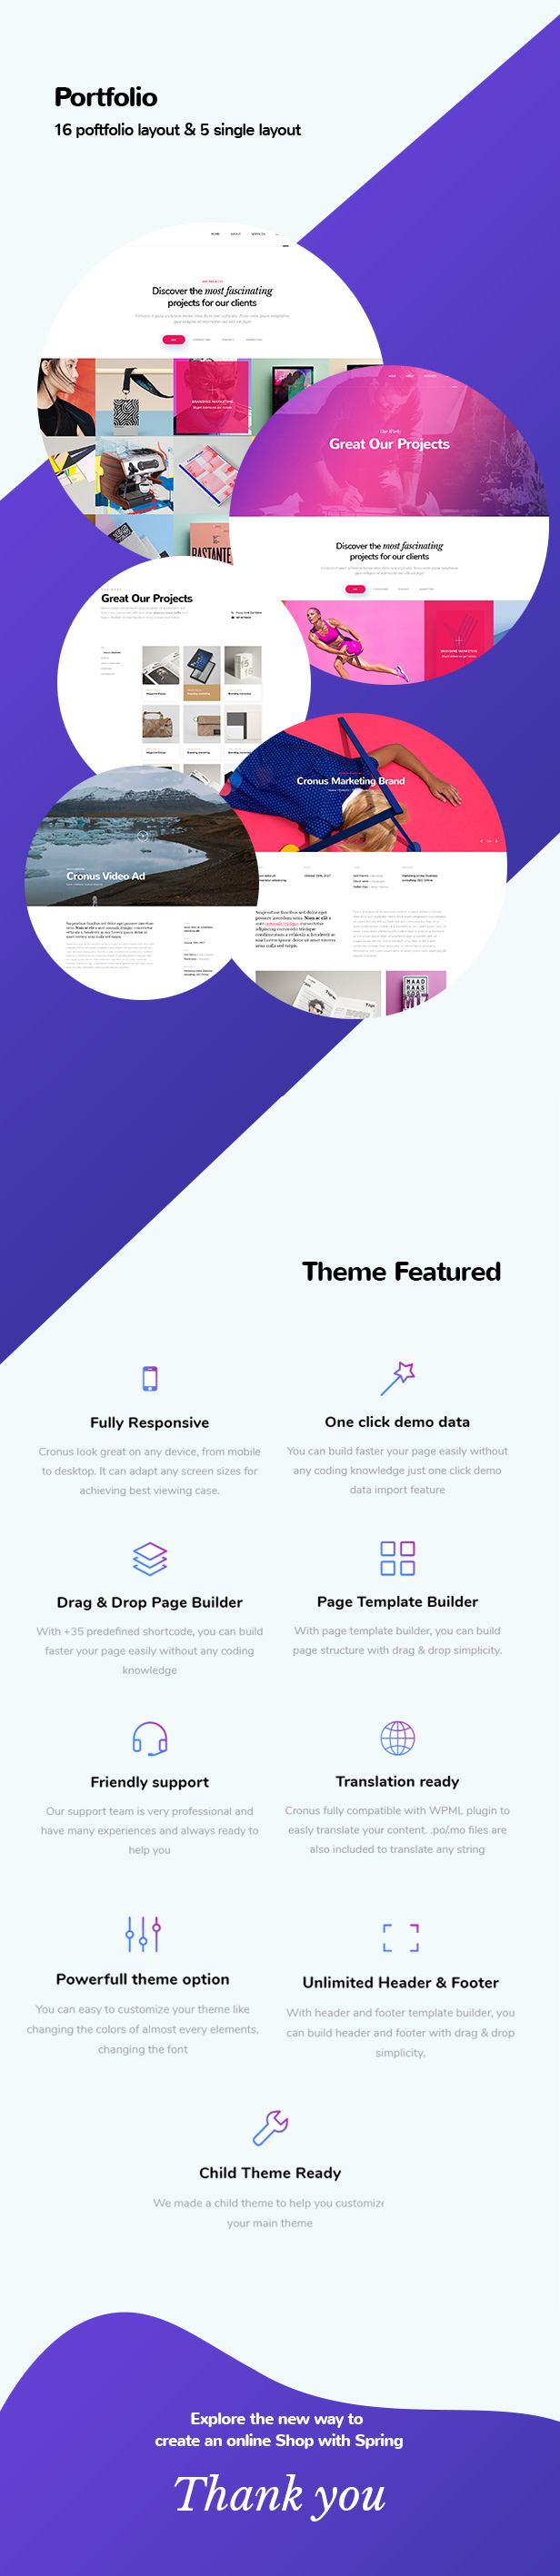 Cronus Plus - Corporate Business und Agentur WordPress Theme - 2